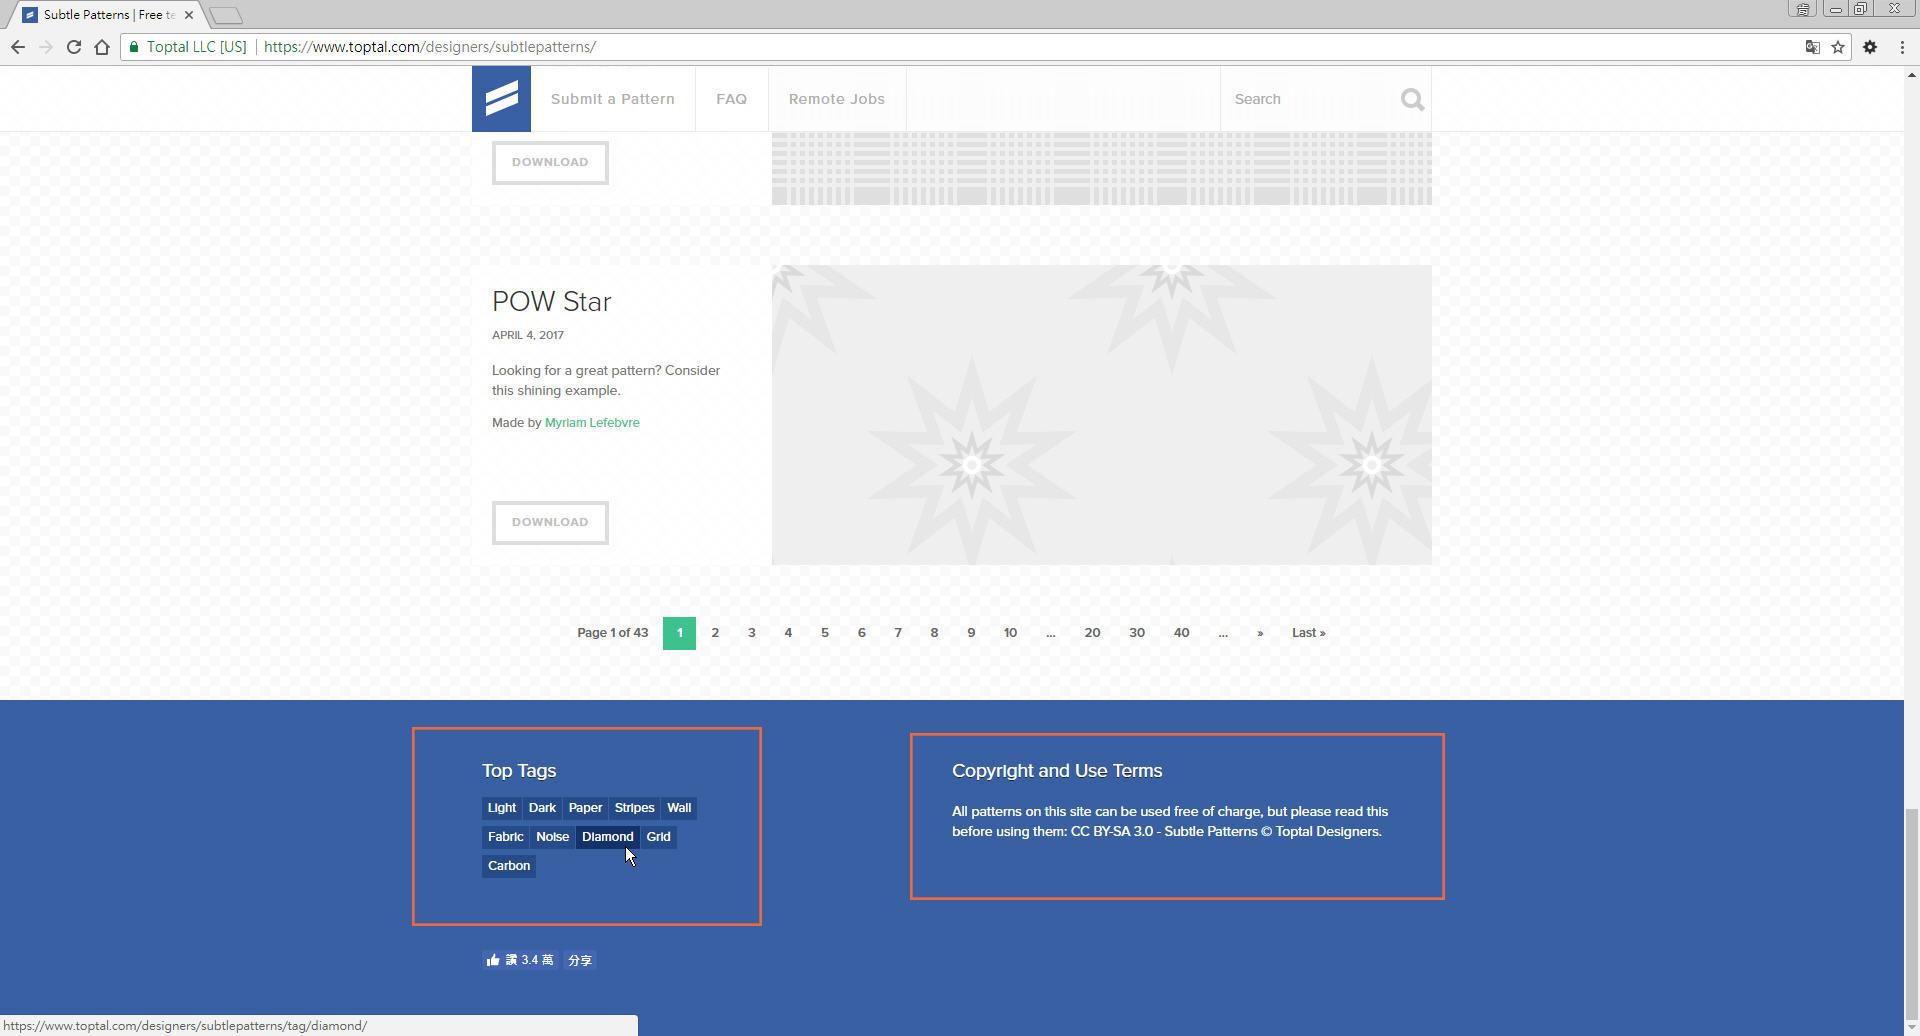 Free Resource 好康報報 Good Design 好站報報  - 【設計資源】Subtle Patterns - 免費下載之 pattern 素材網站 - p-10